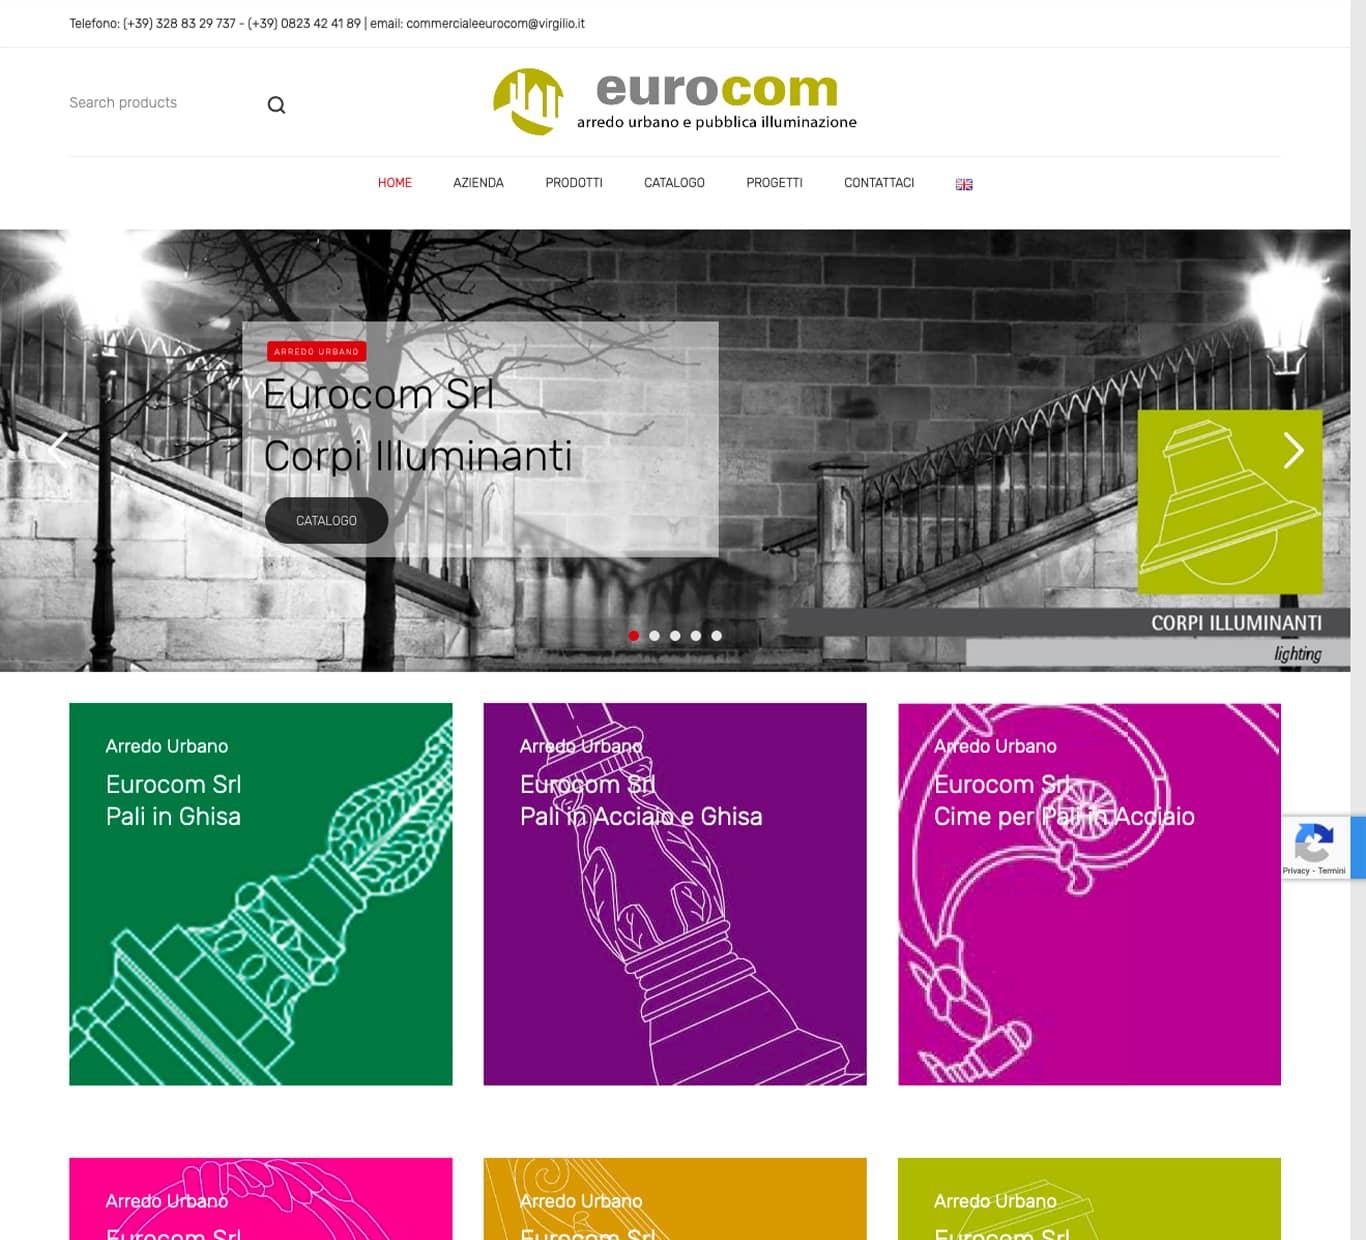 screenshot i nostri successi con Eurocom Arredo Urbano